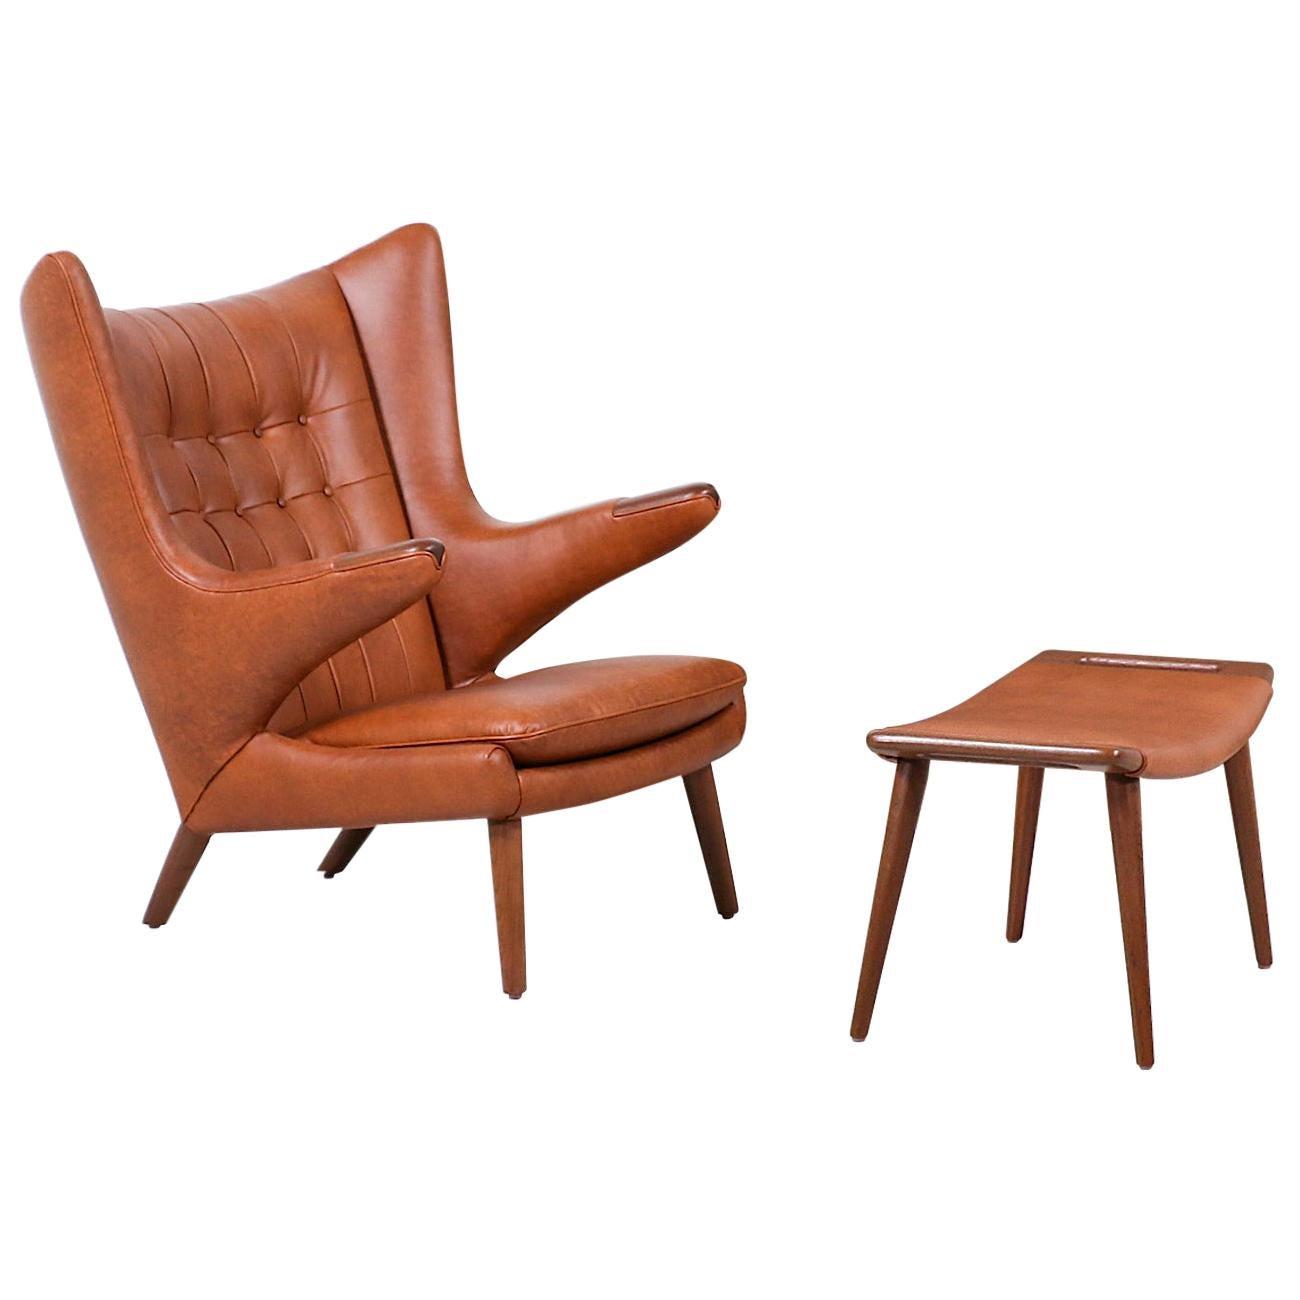 "Hans J. Wegner Cognac Leather ""Papa Bear"" Chair with Ottoman for A.P. Stolen Møb"